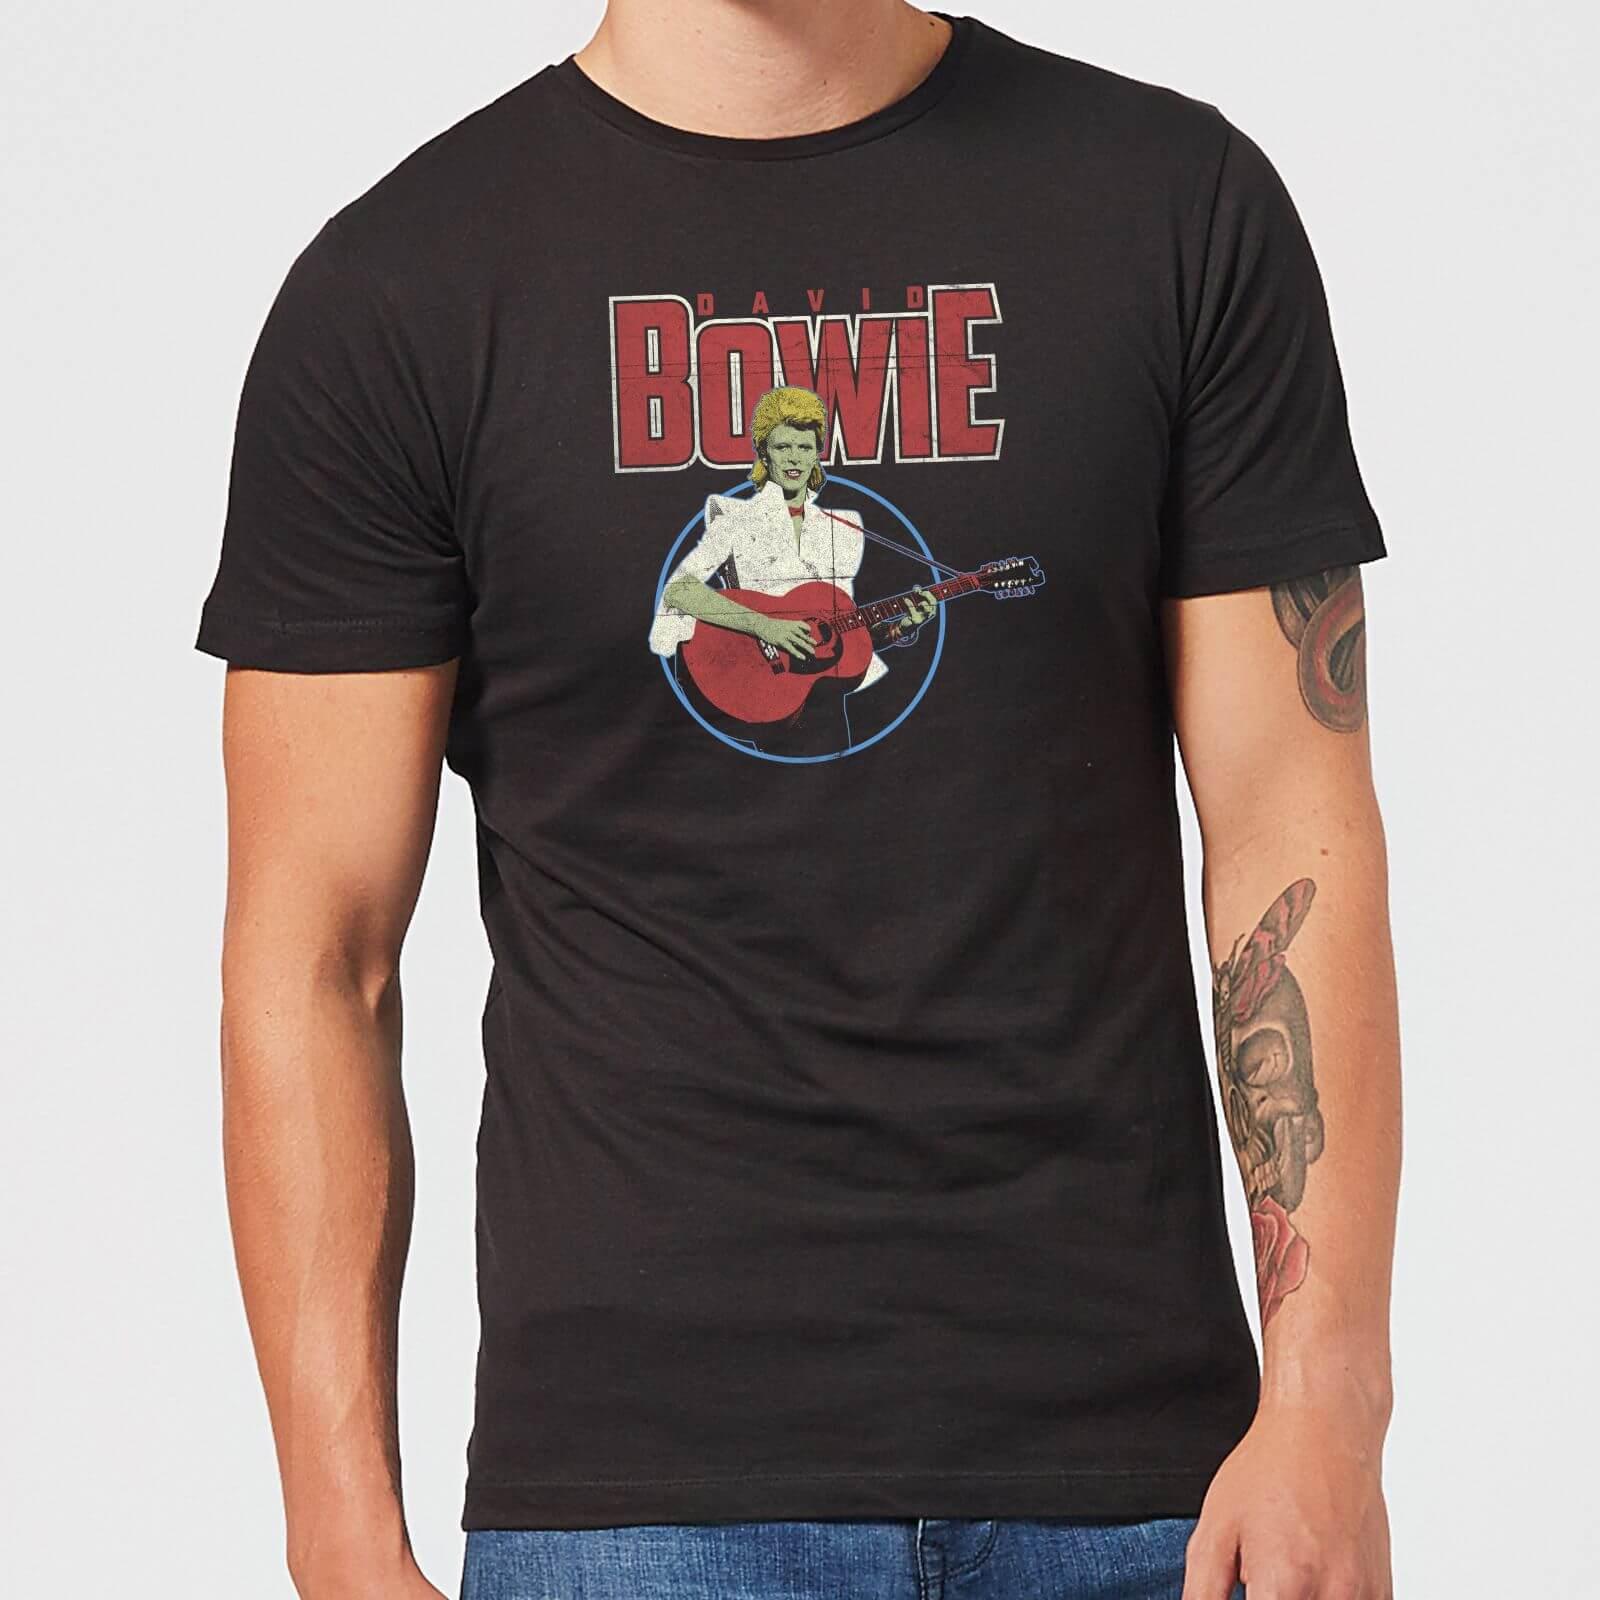 David Bowie Bootleg Men's T-Shirt - Black - 5XL - Black